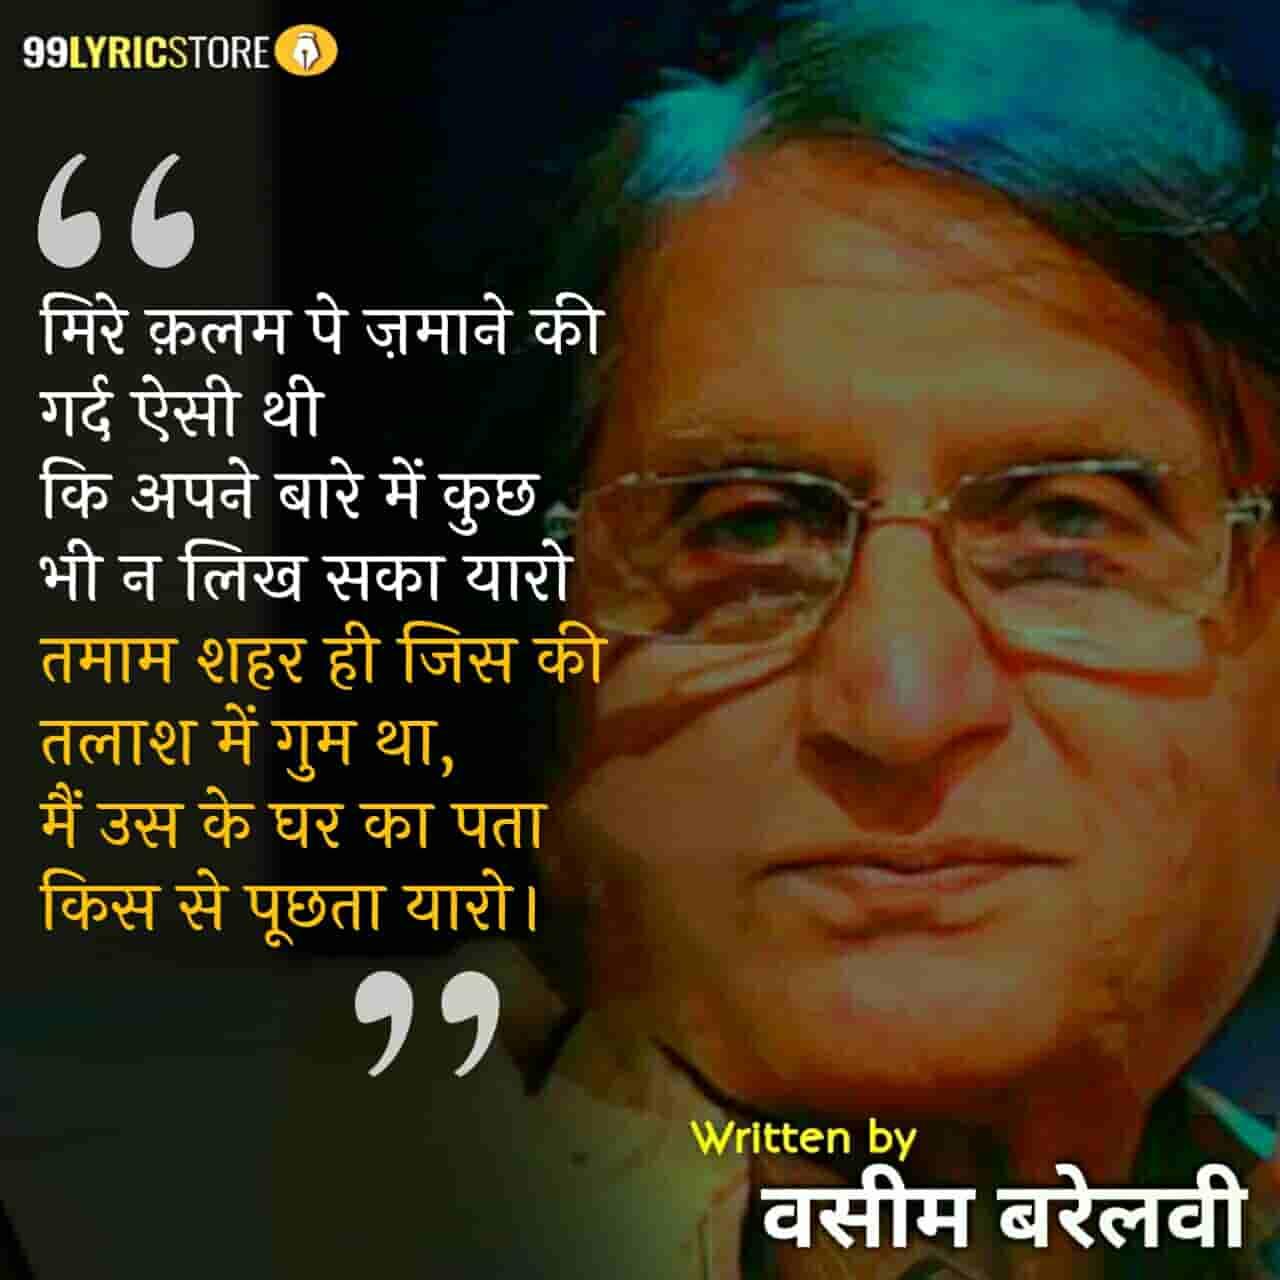 This beautiful ghazal 'Mili Hawaon Mein Udne Ki Wo Saza Yaaro' has written by Waseem Barelvi.